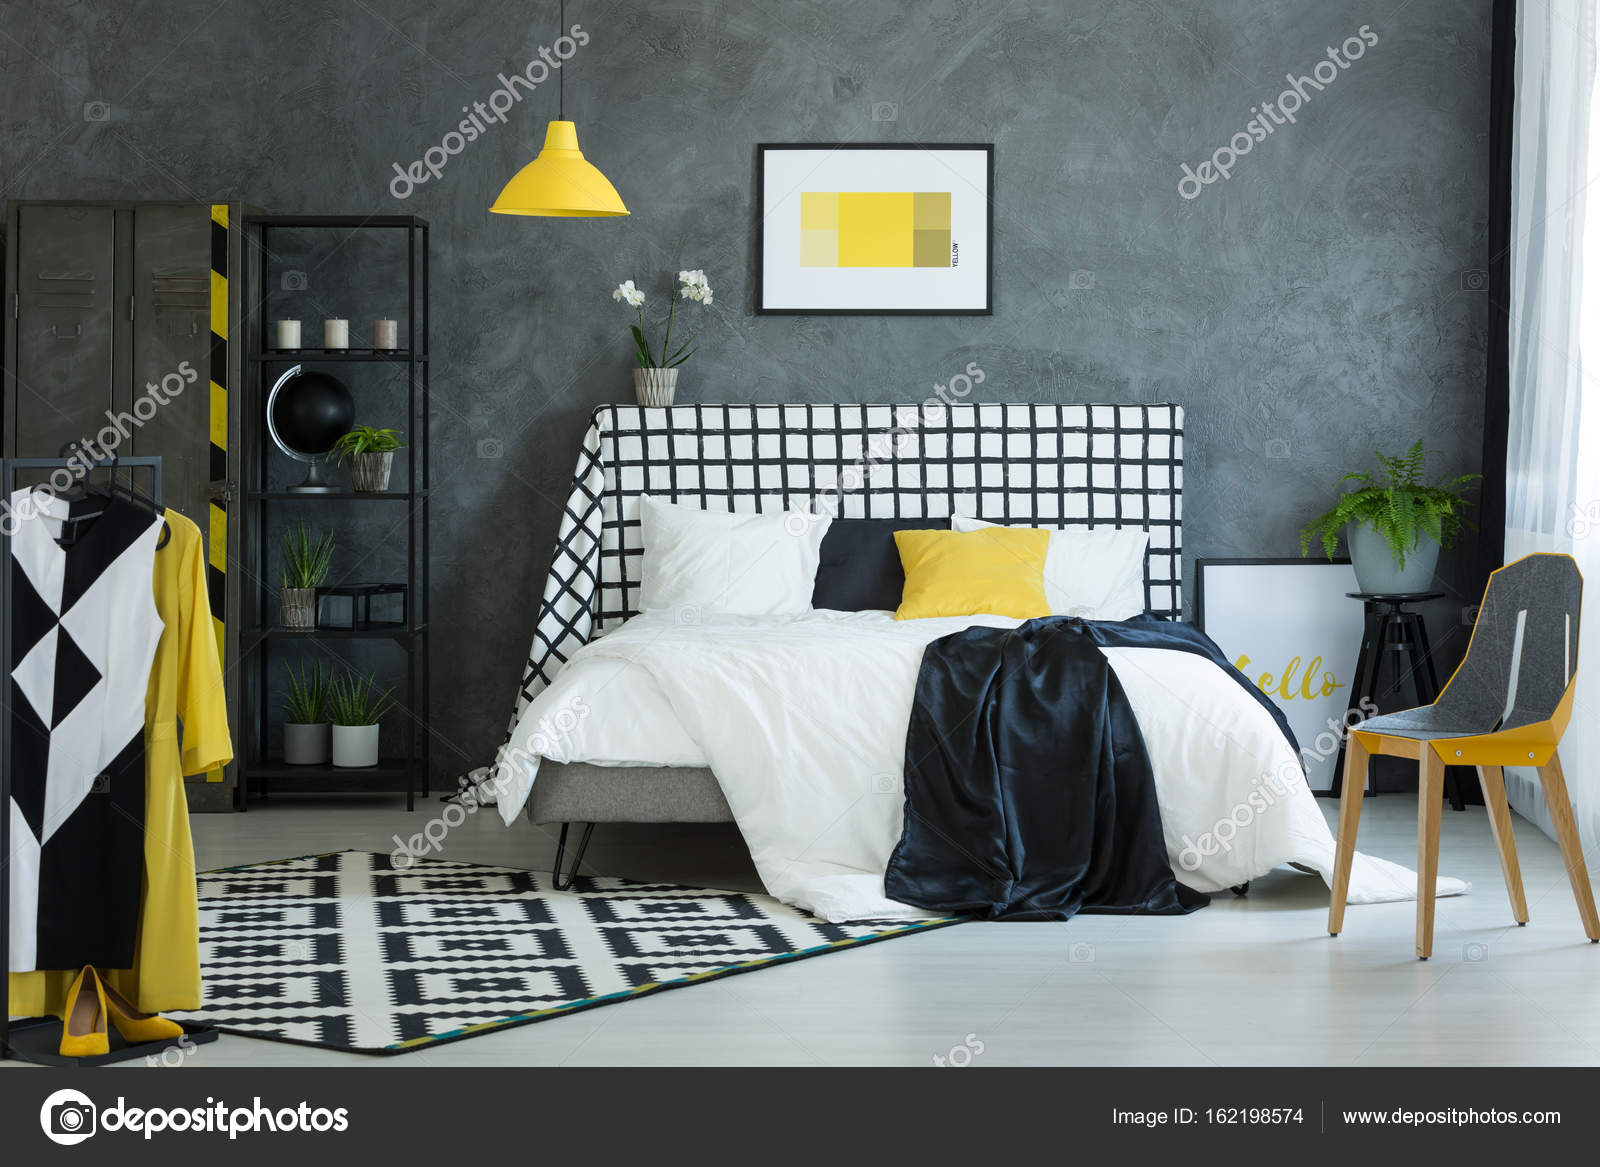 Schülers Schlafzimmer mit schwarzen Kugel — Stockfoto © photographee ...